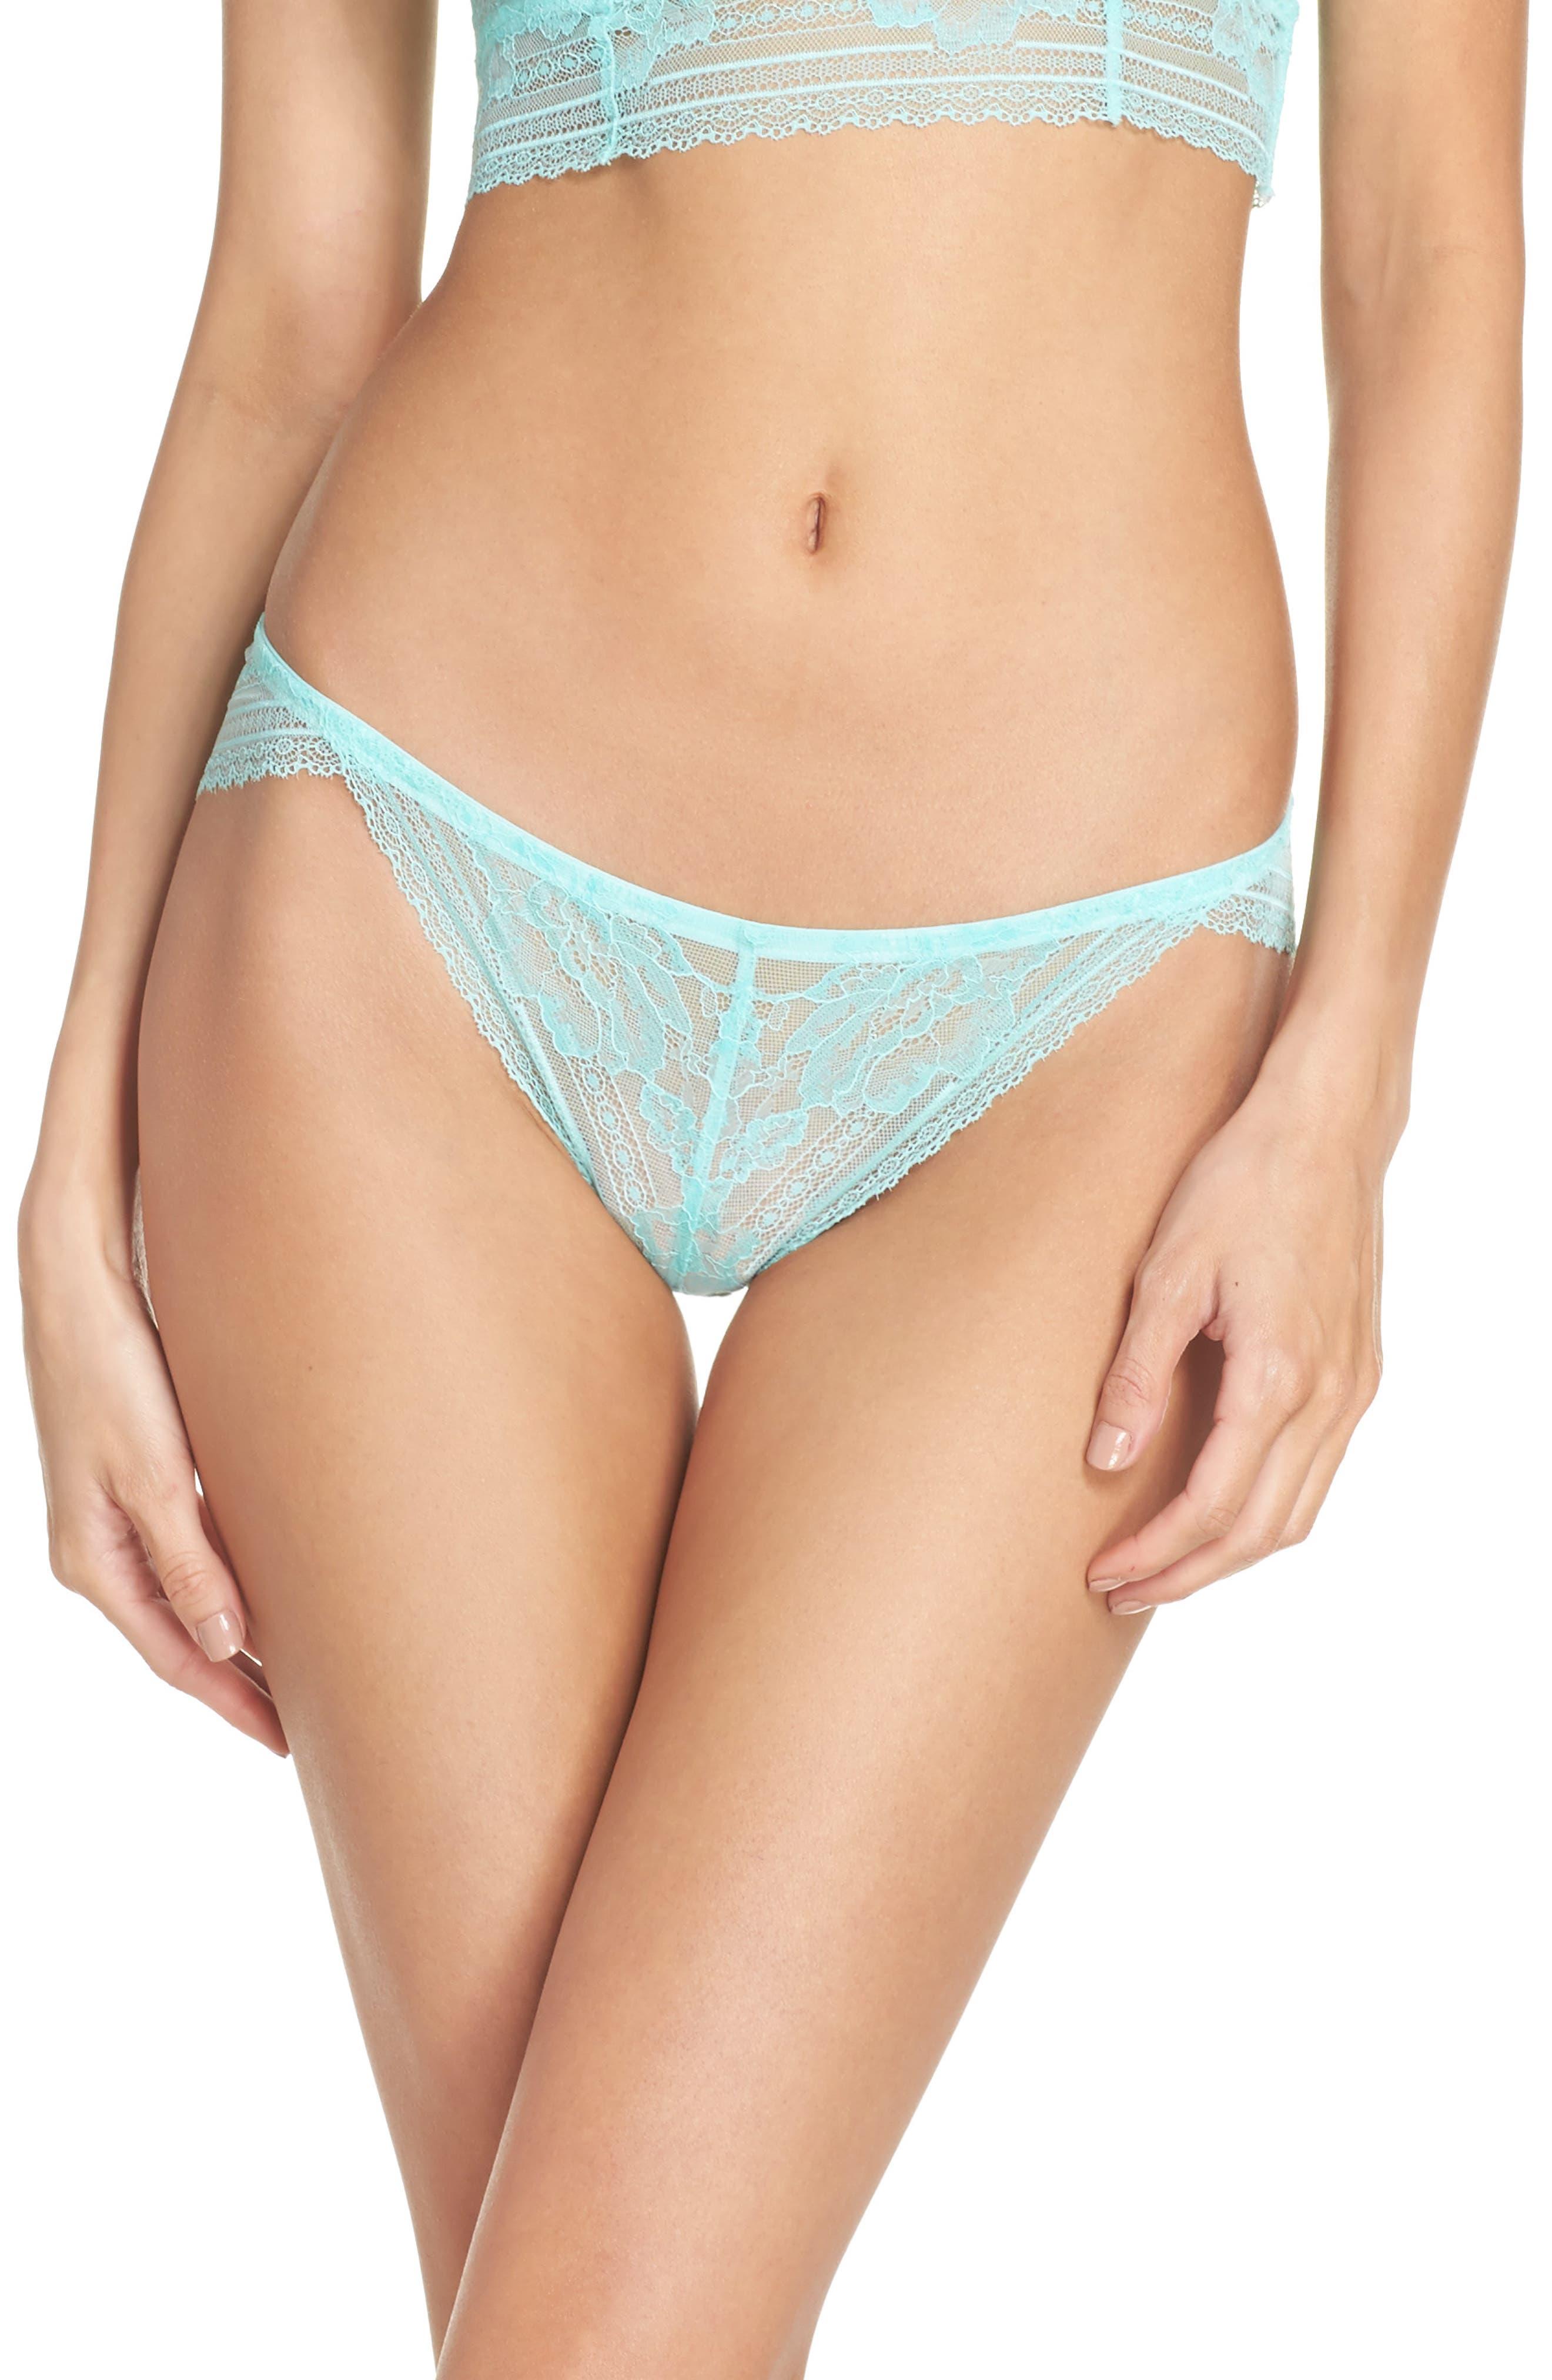 Intimately FP Sorento Lace Bikini,                         Main,                         color, Mint